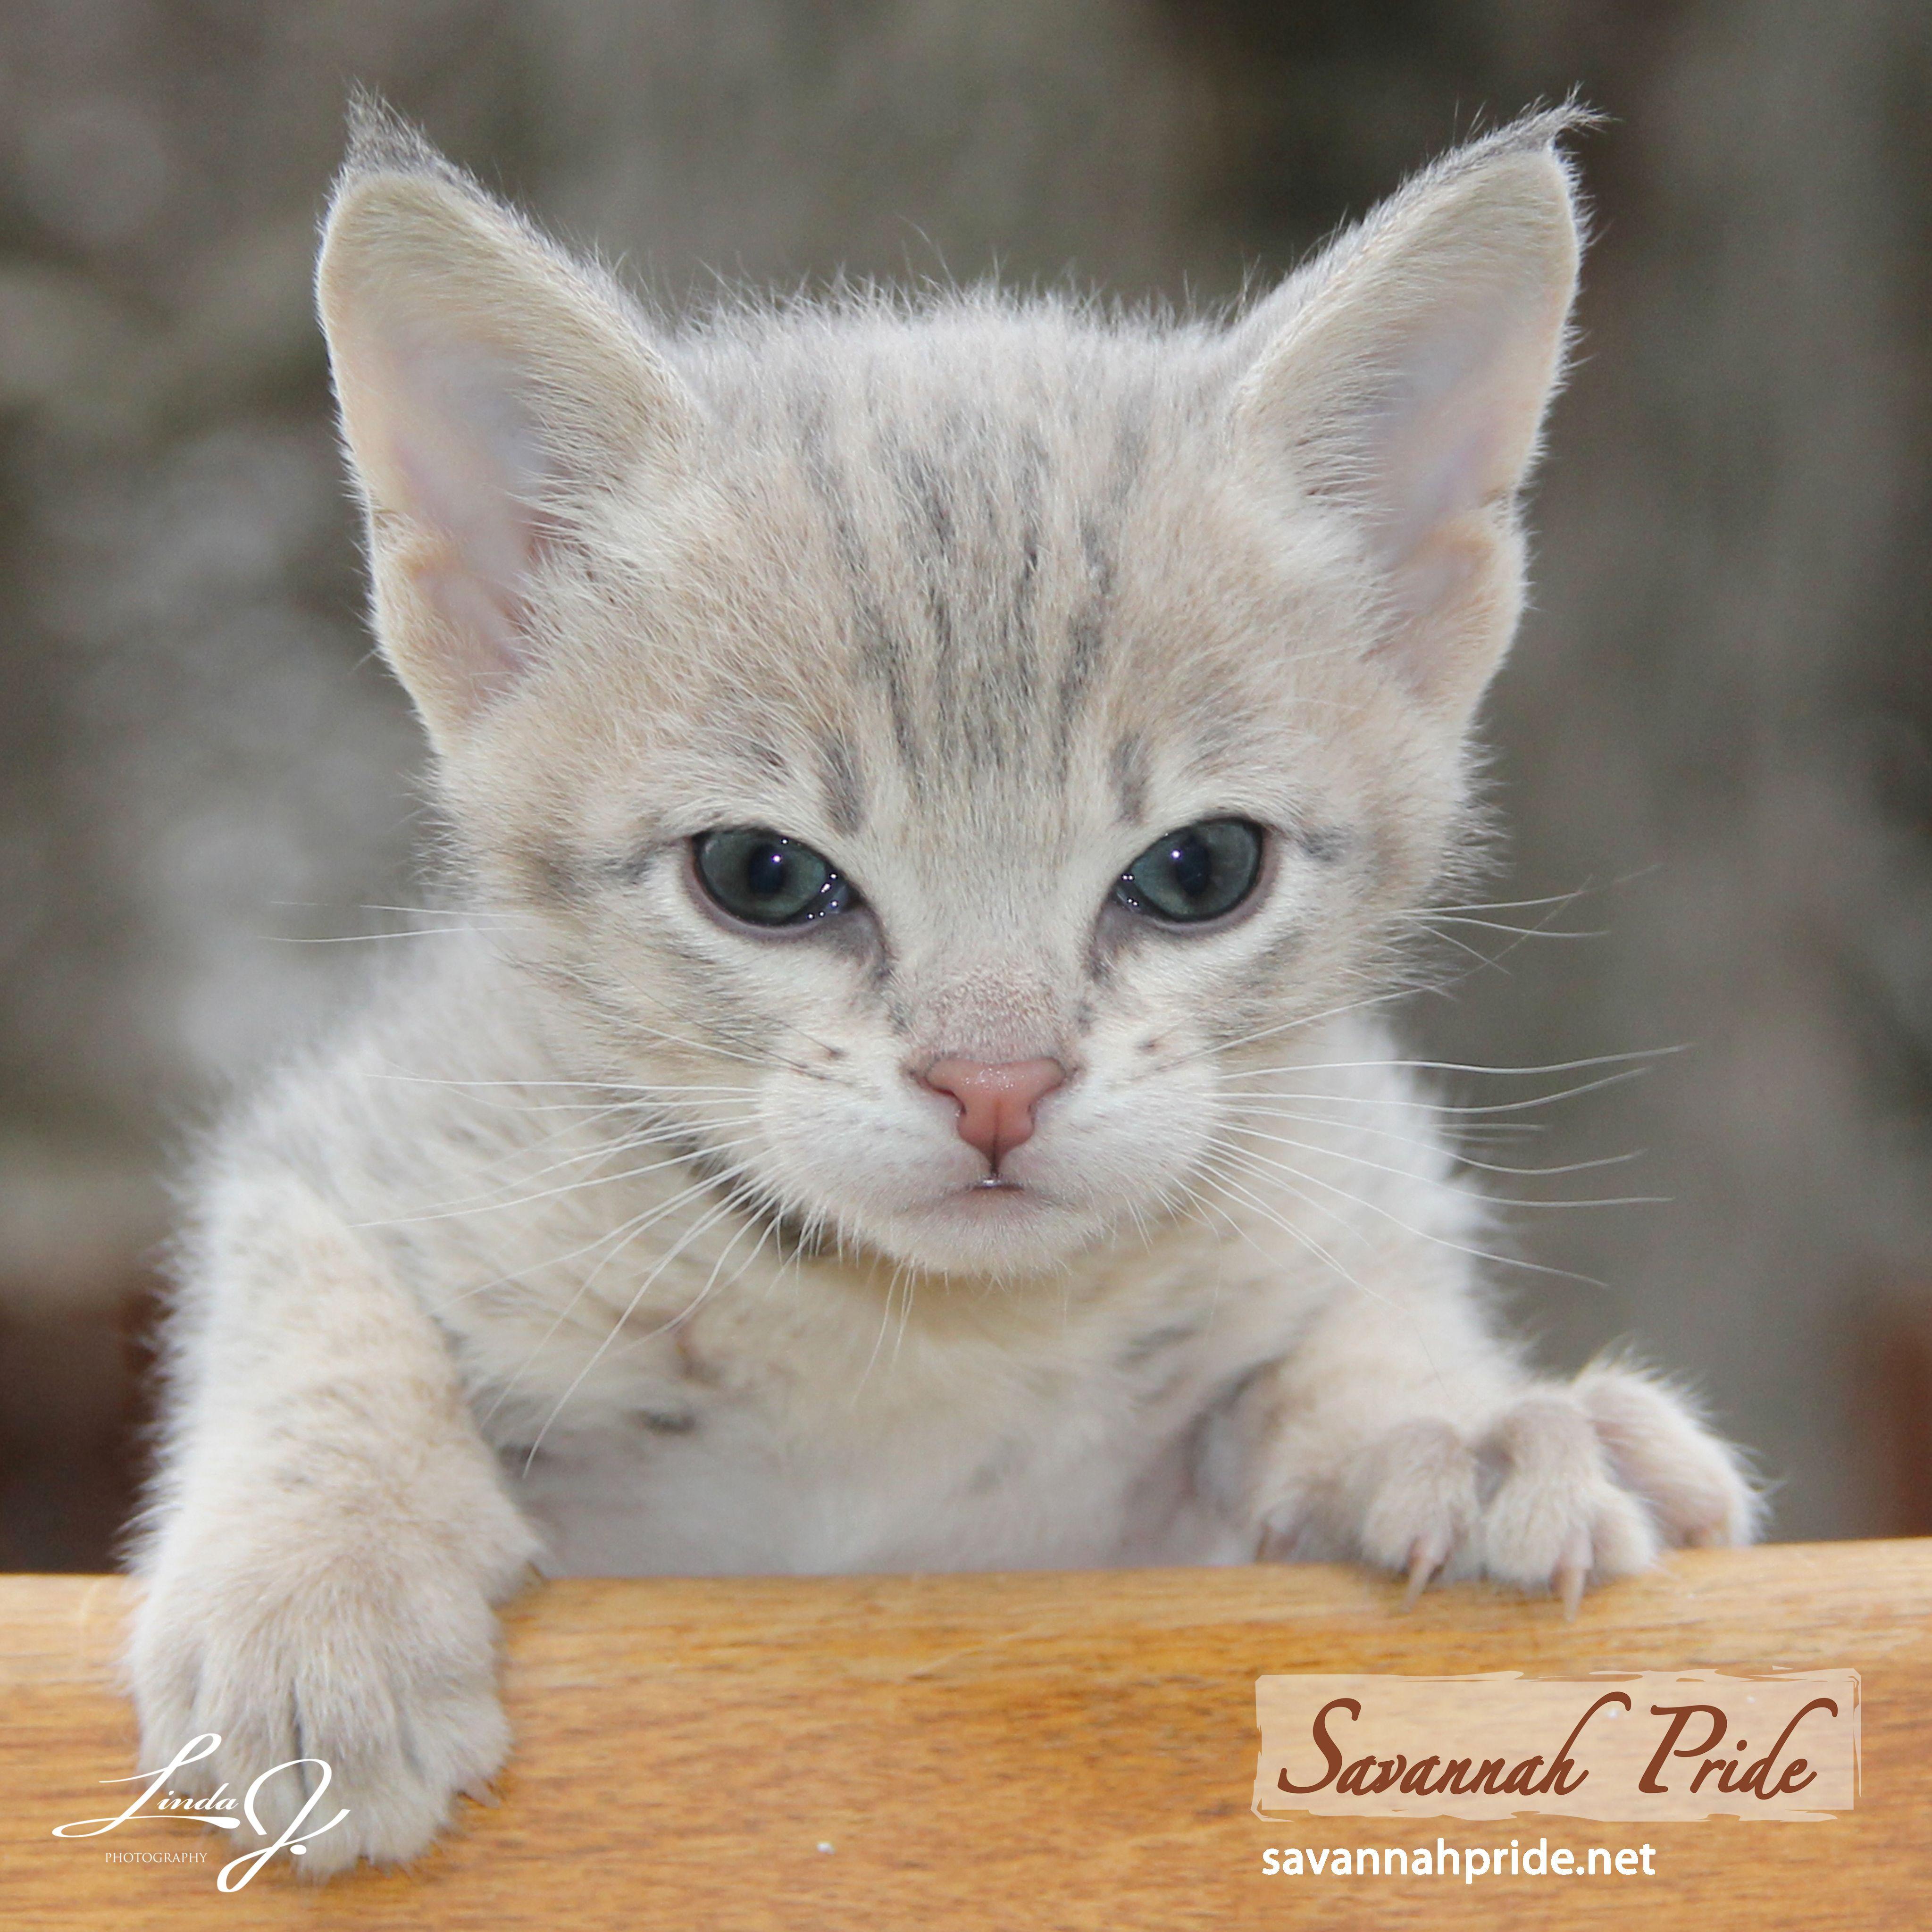 F2 Blue Savannah Cat Kitten Savannah Pride A Tica Registered